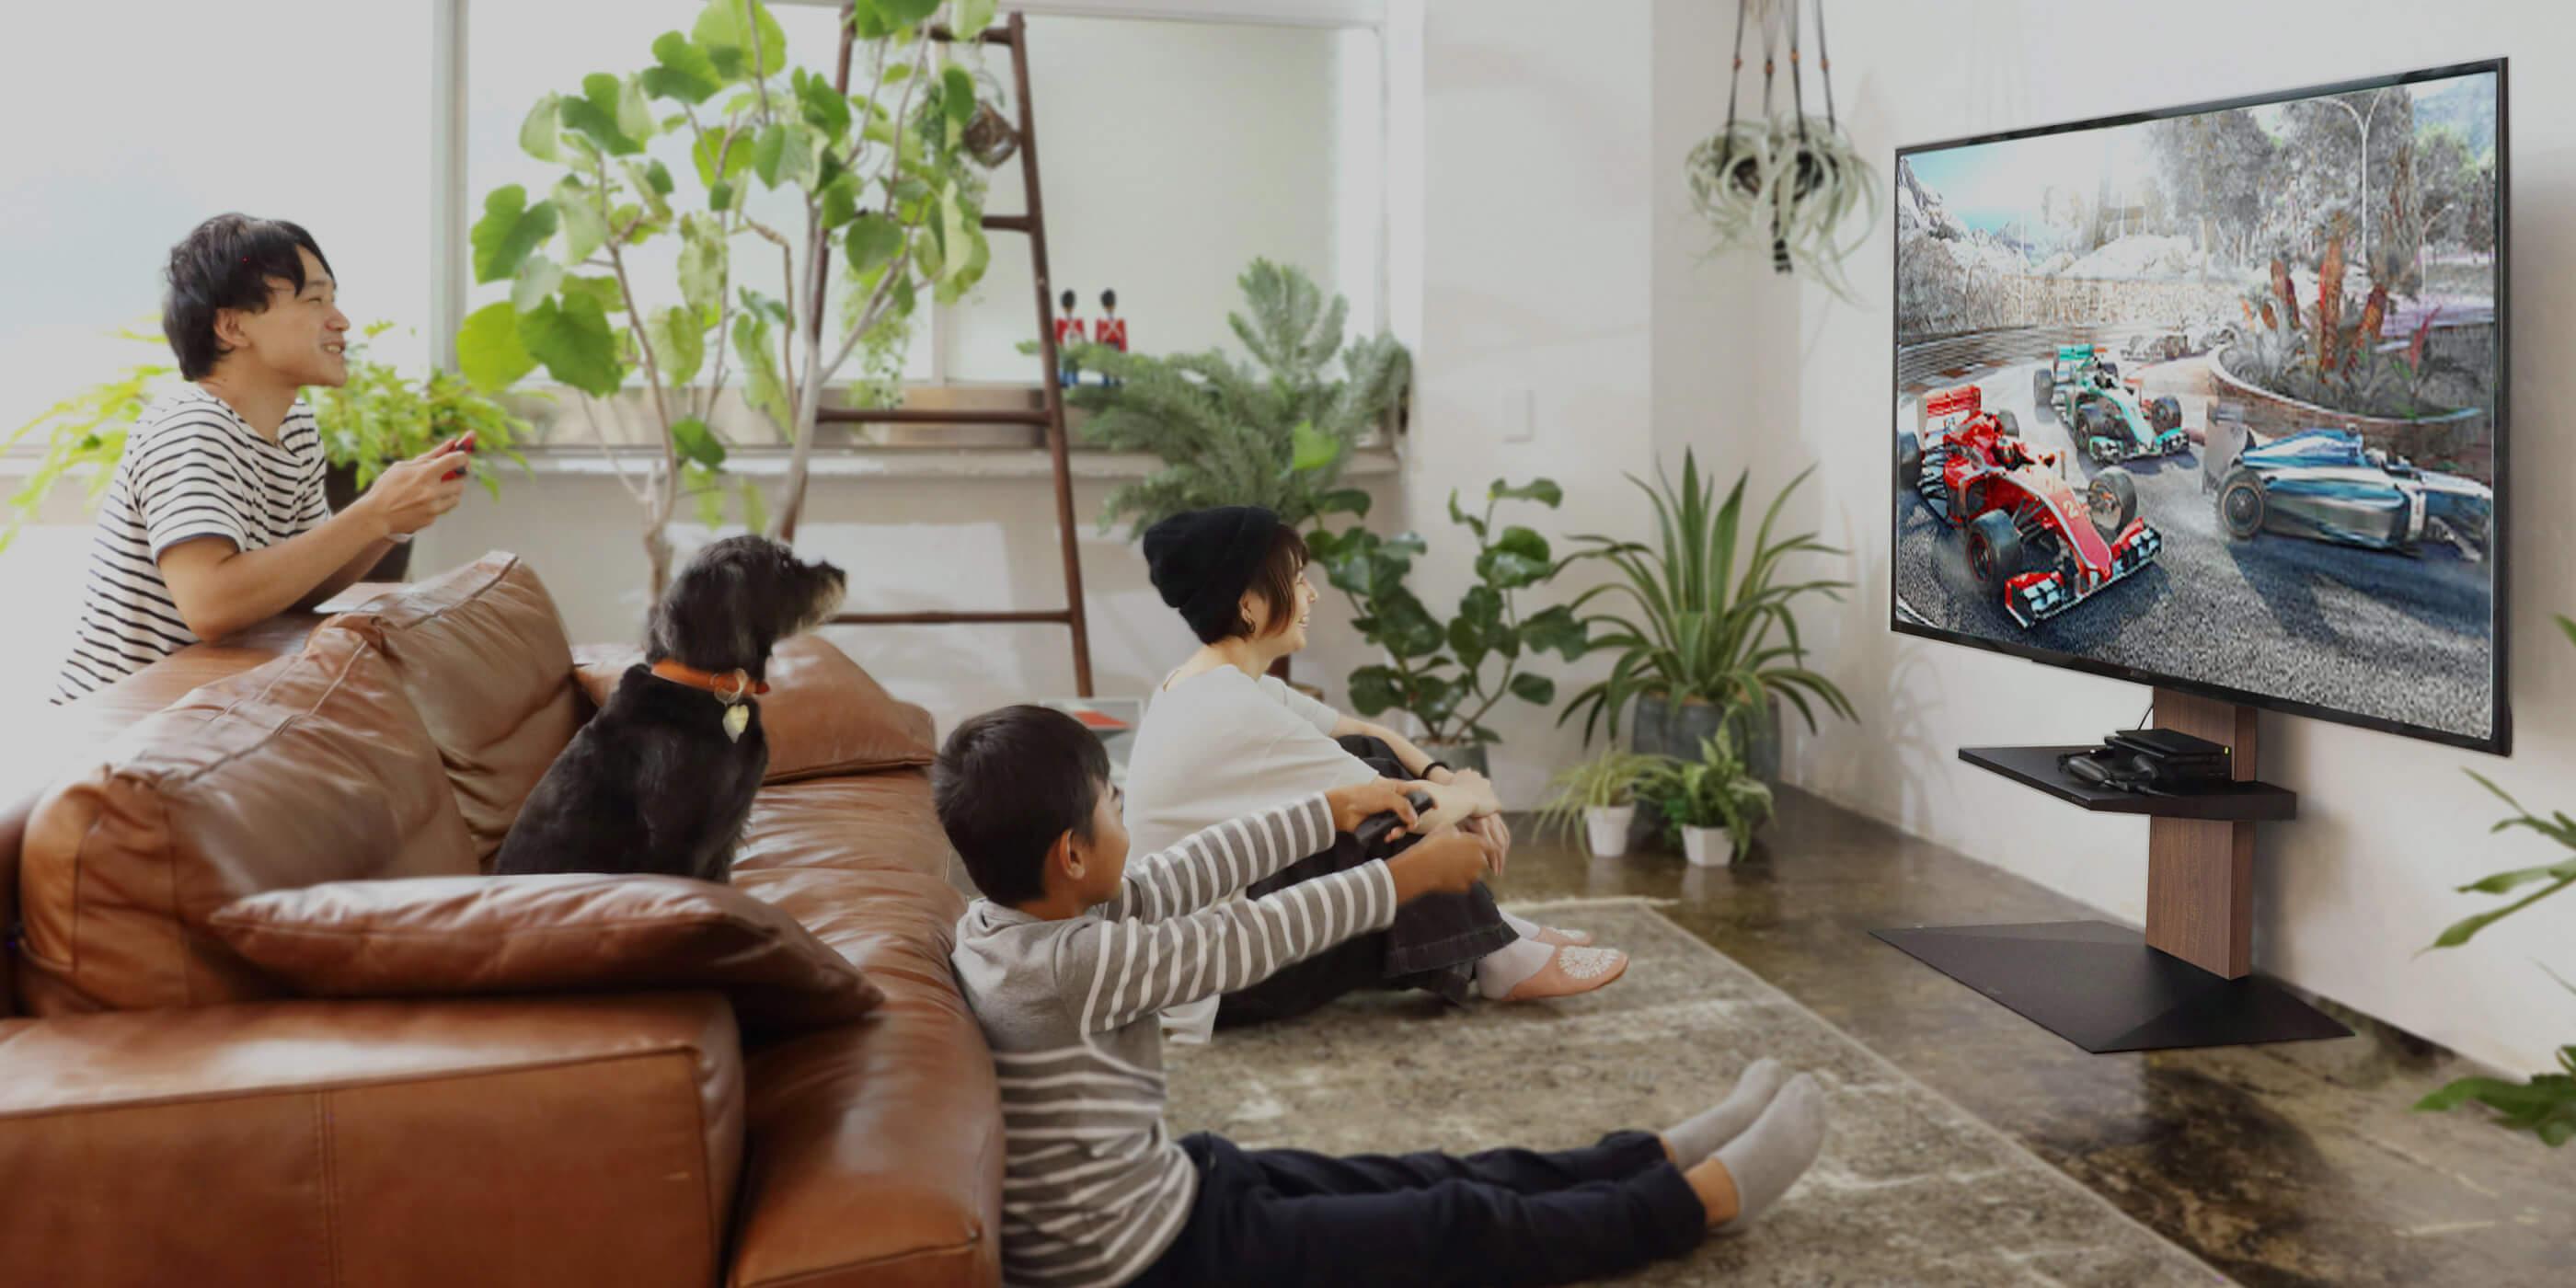 WALL INTERIOR TV STAND V3 壁寄せテレビスタンドV3